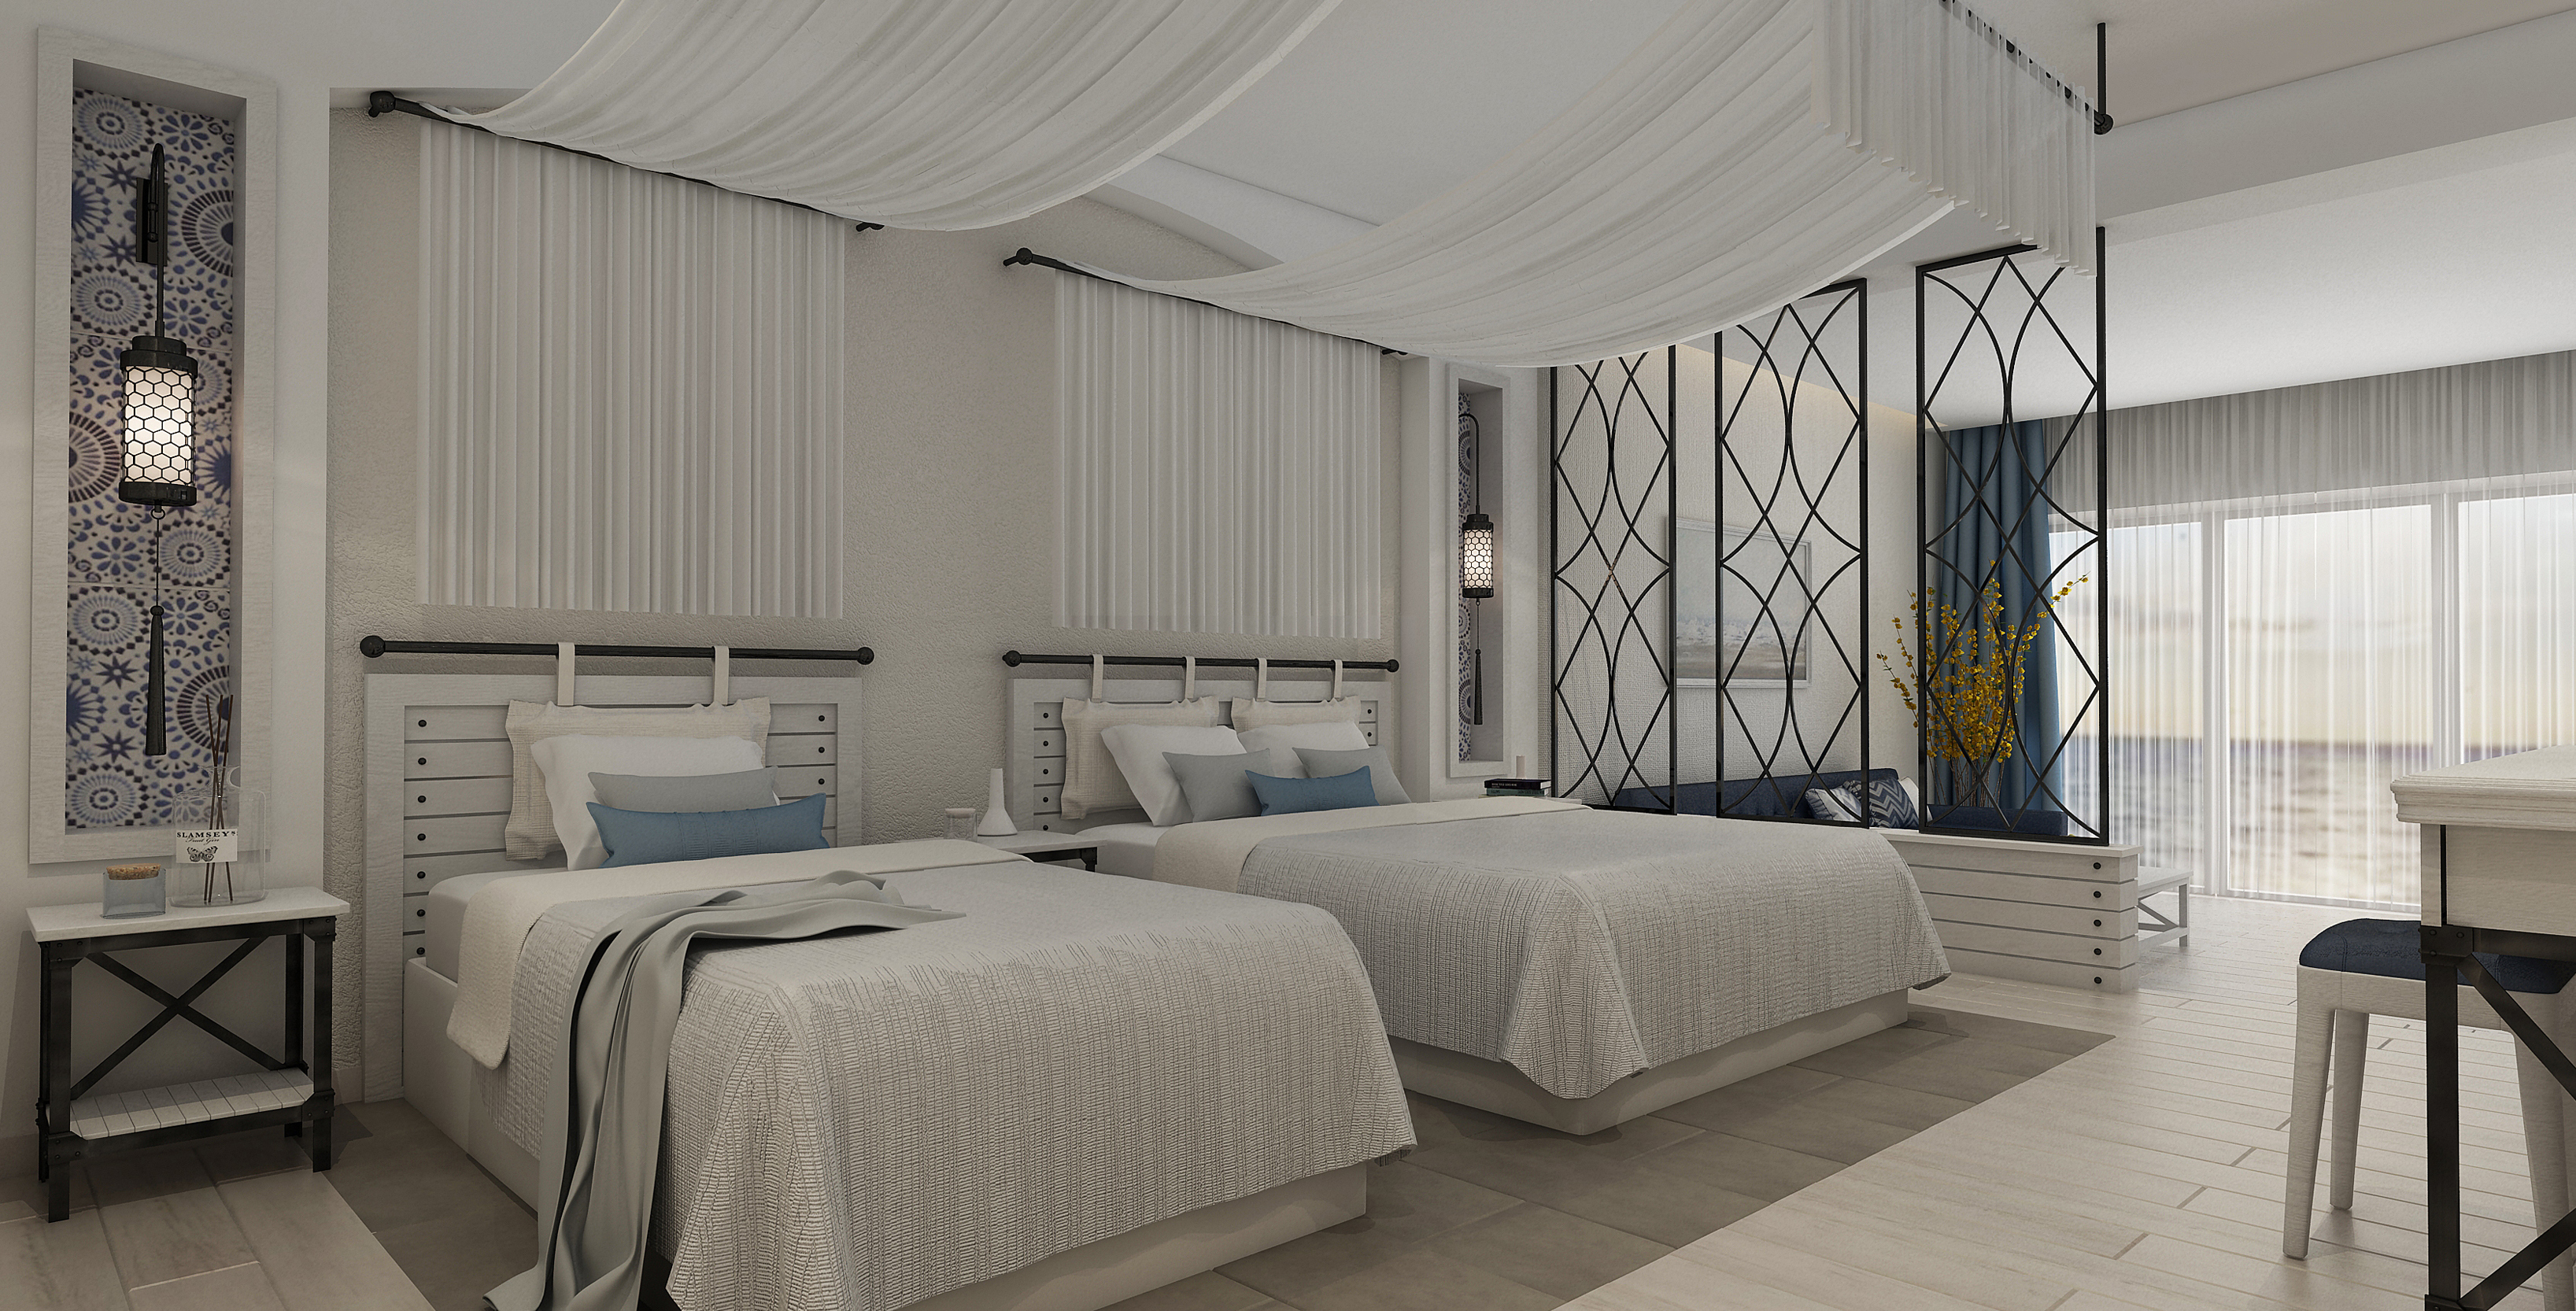 LATO 2018: Limak Bafra Deluxe Hotel & Resort*****, 8 dni (01-08.06.2018 r.), ultra all inclusive: 3398,00 PLN/osoba